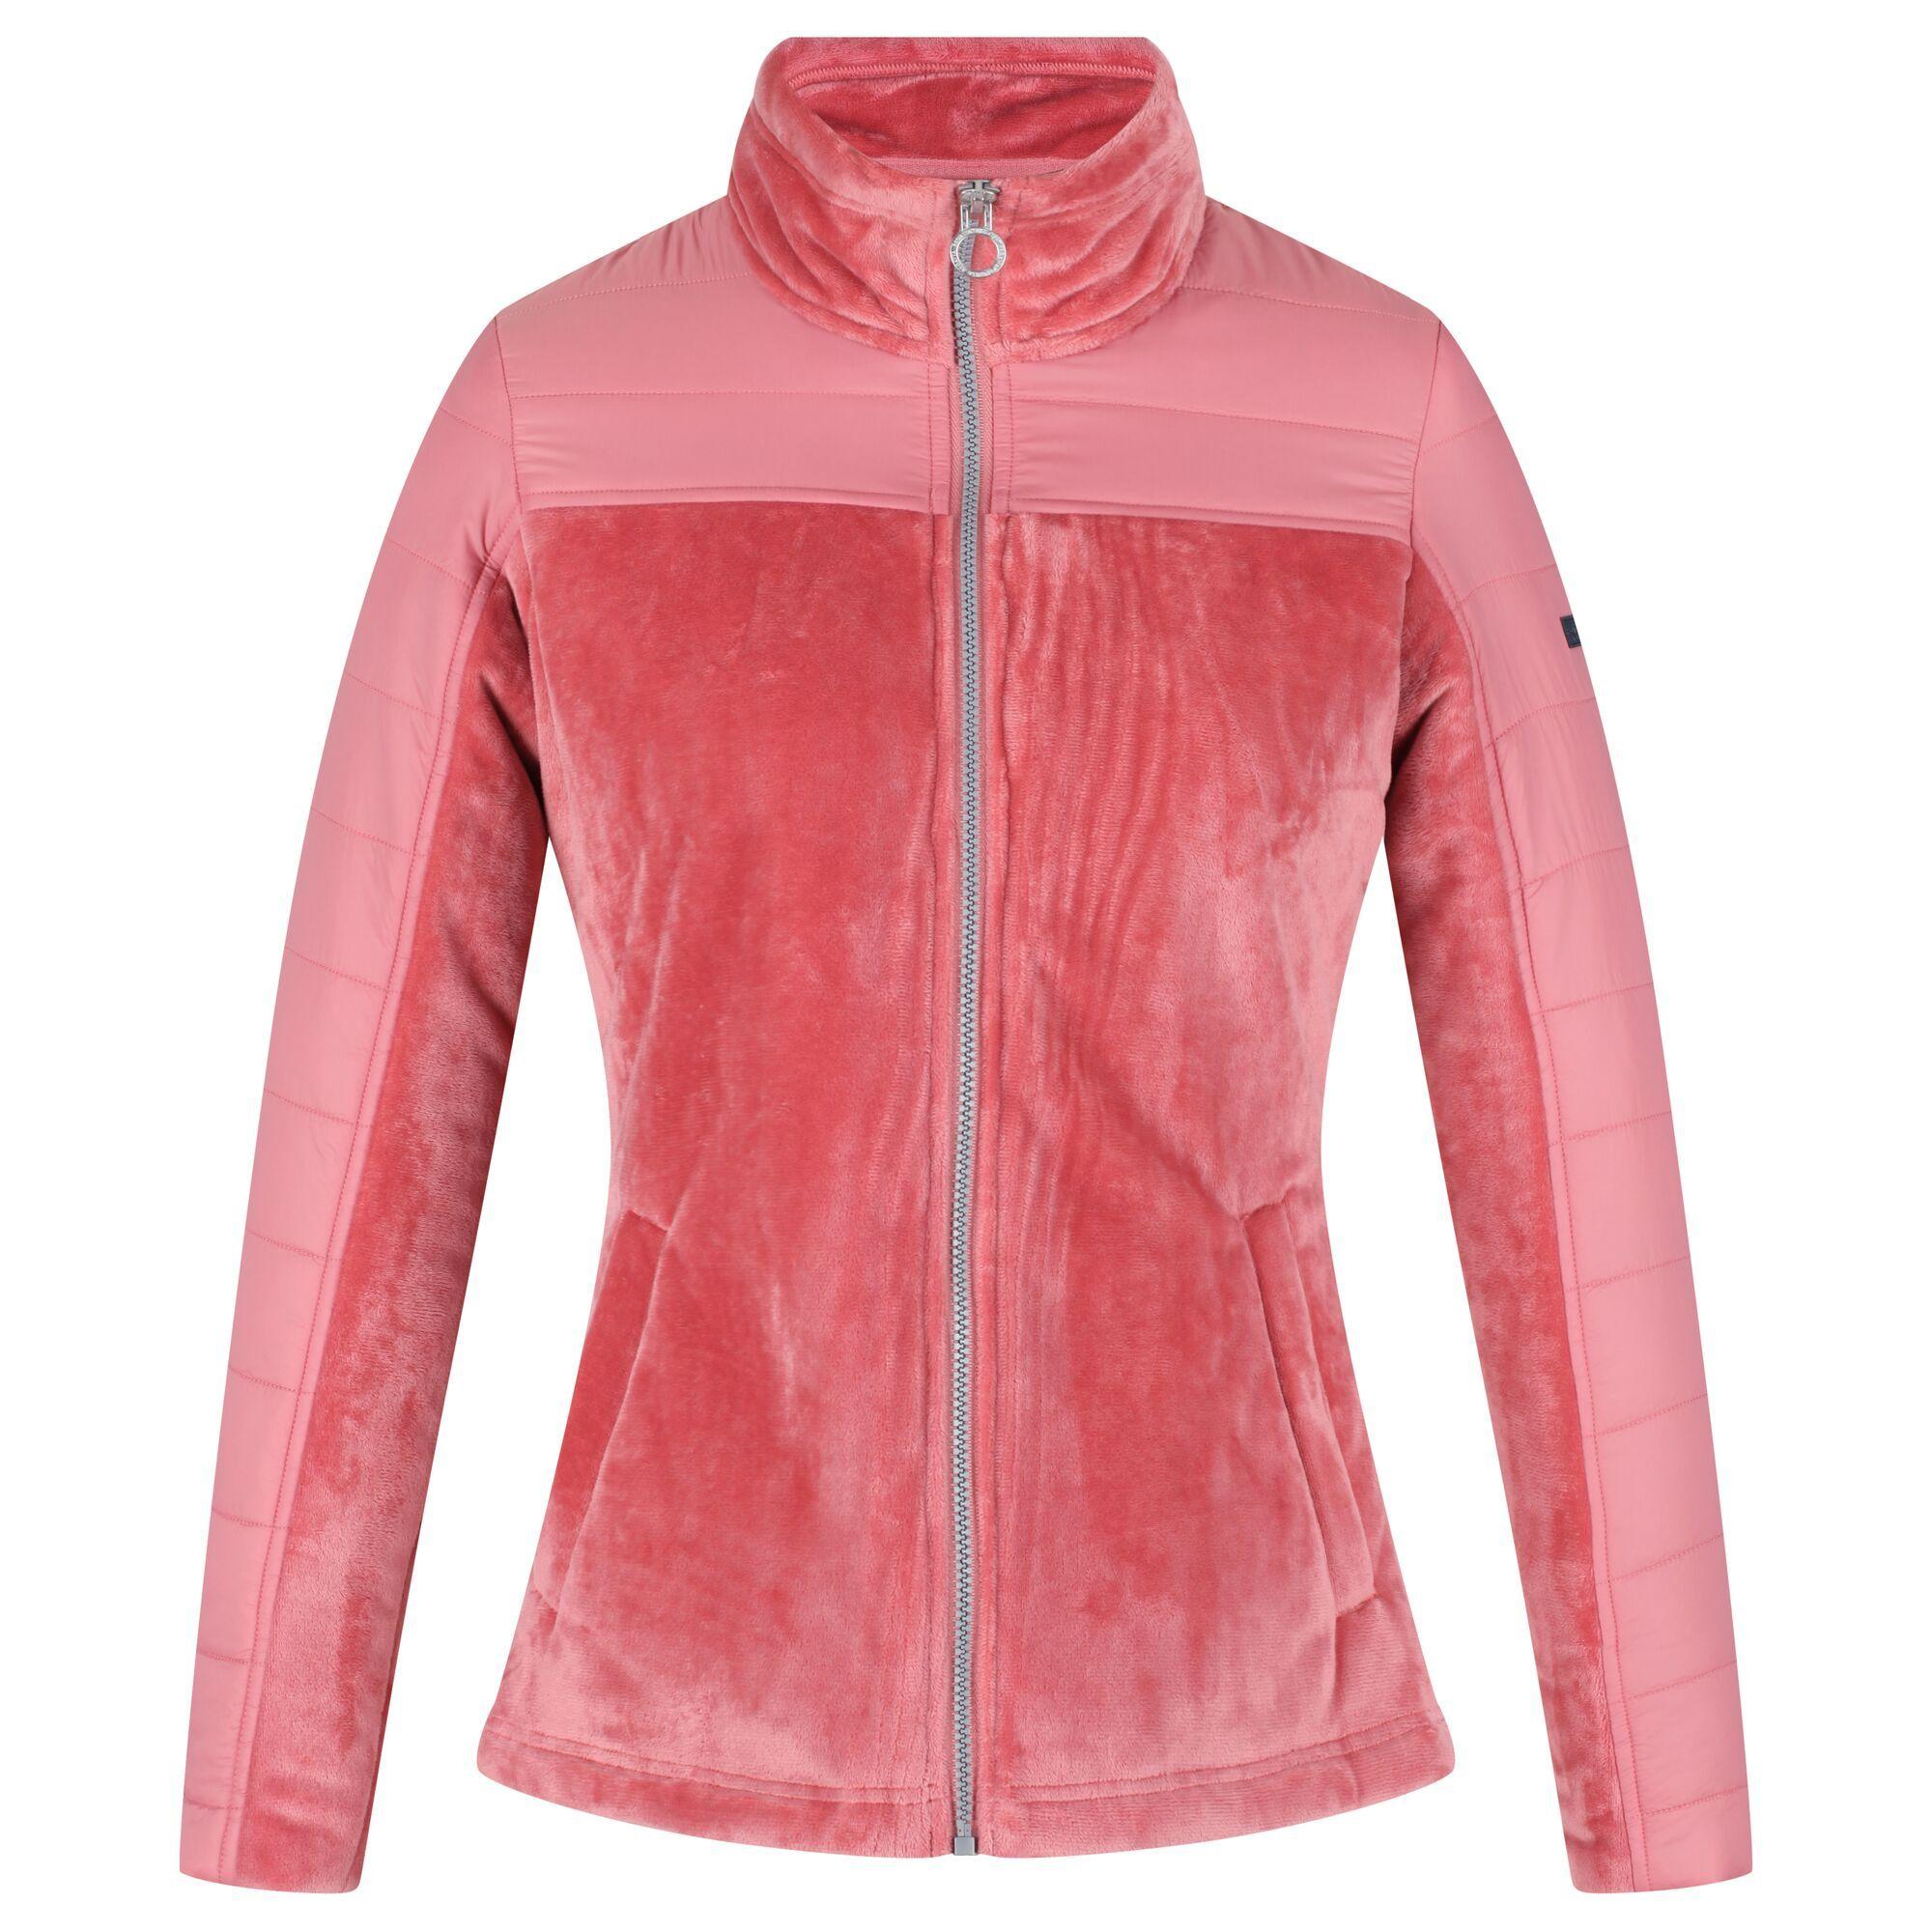 Regatta Womens/Ladies Reinette Quilted Insulated Jacket (16 UK) (Dusty Rose)